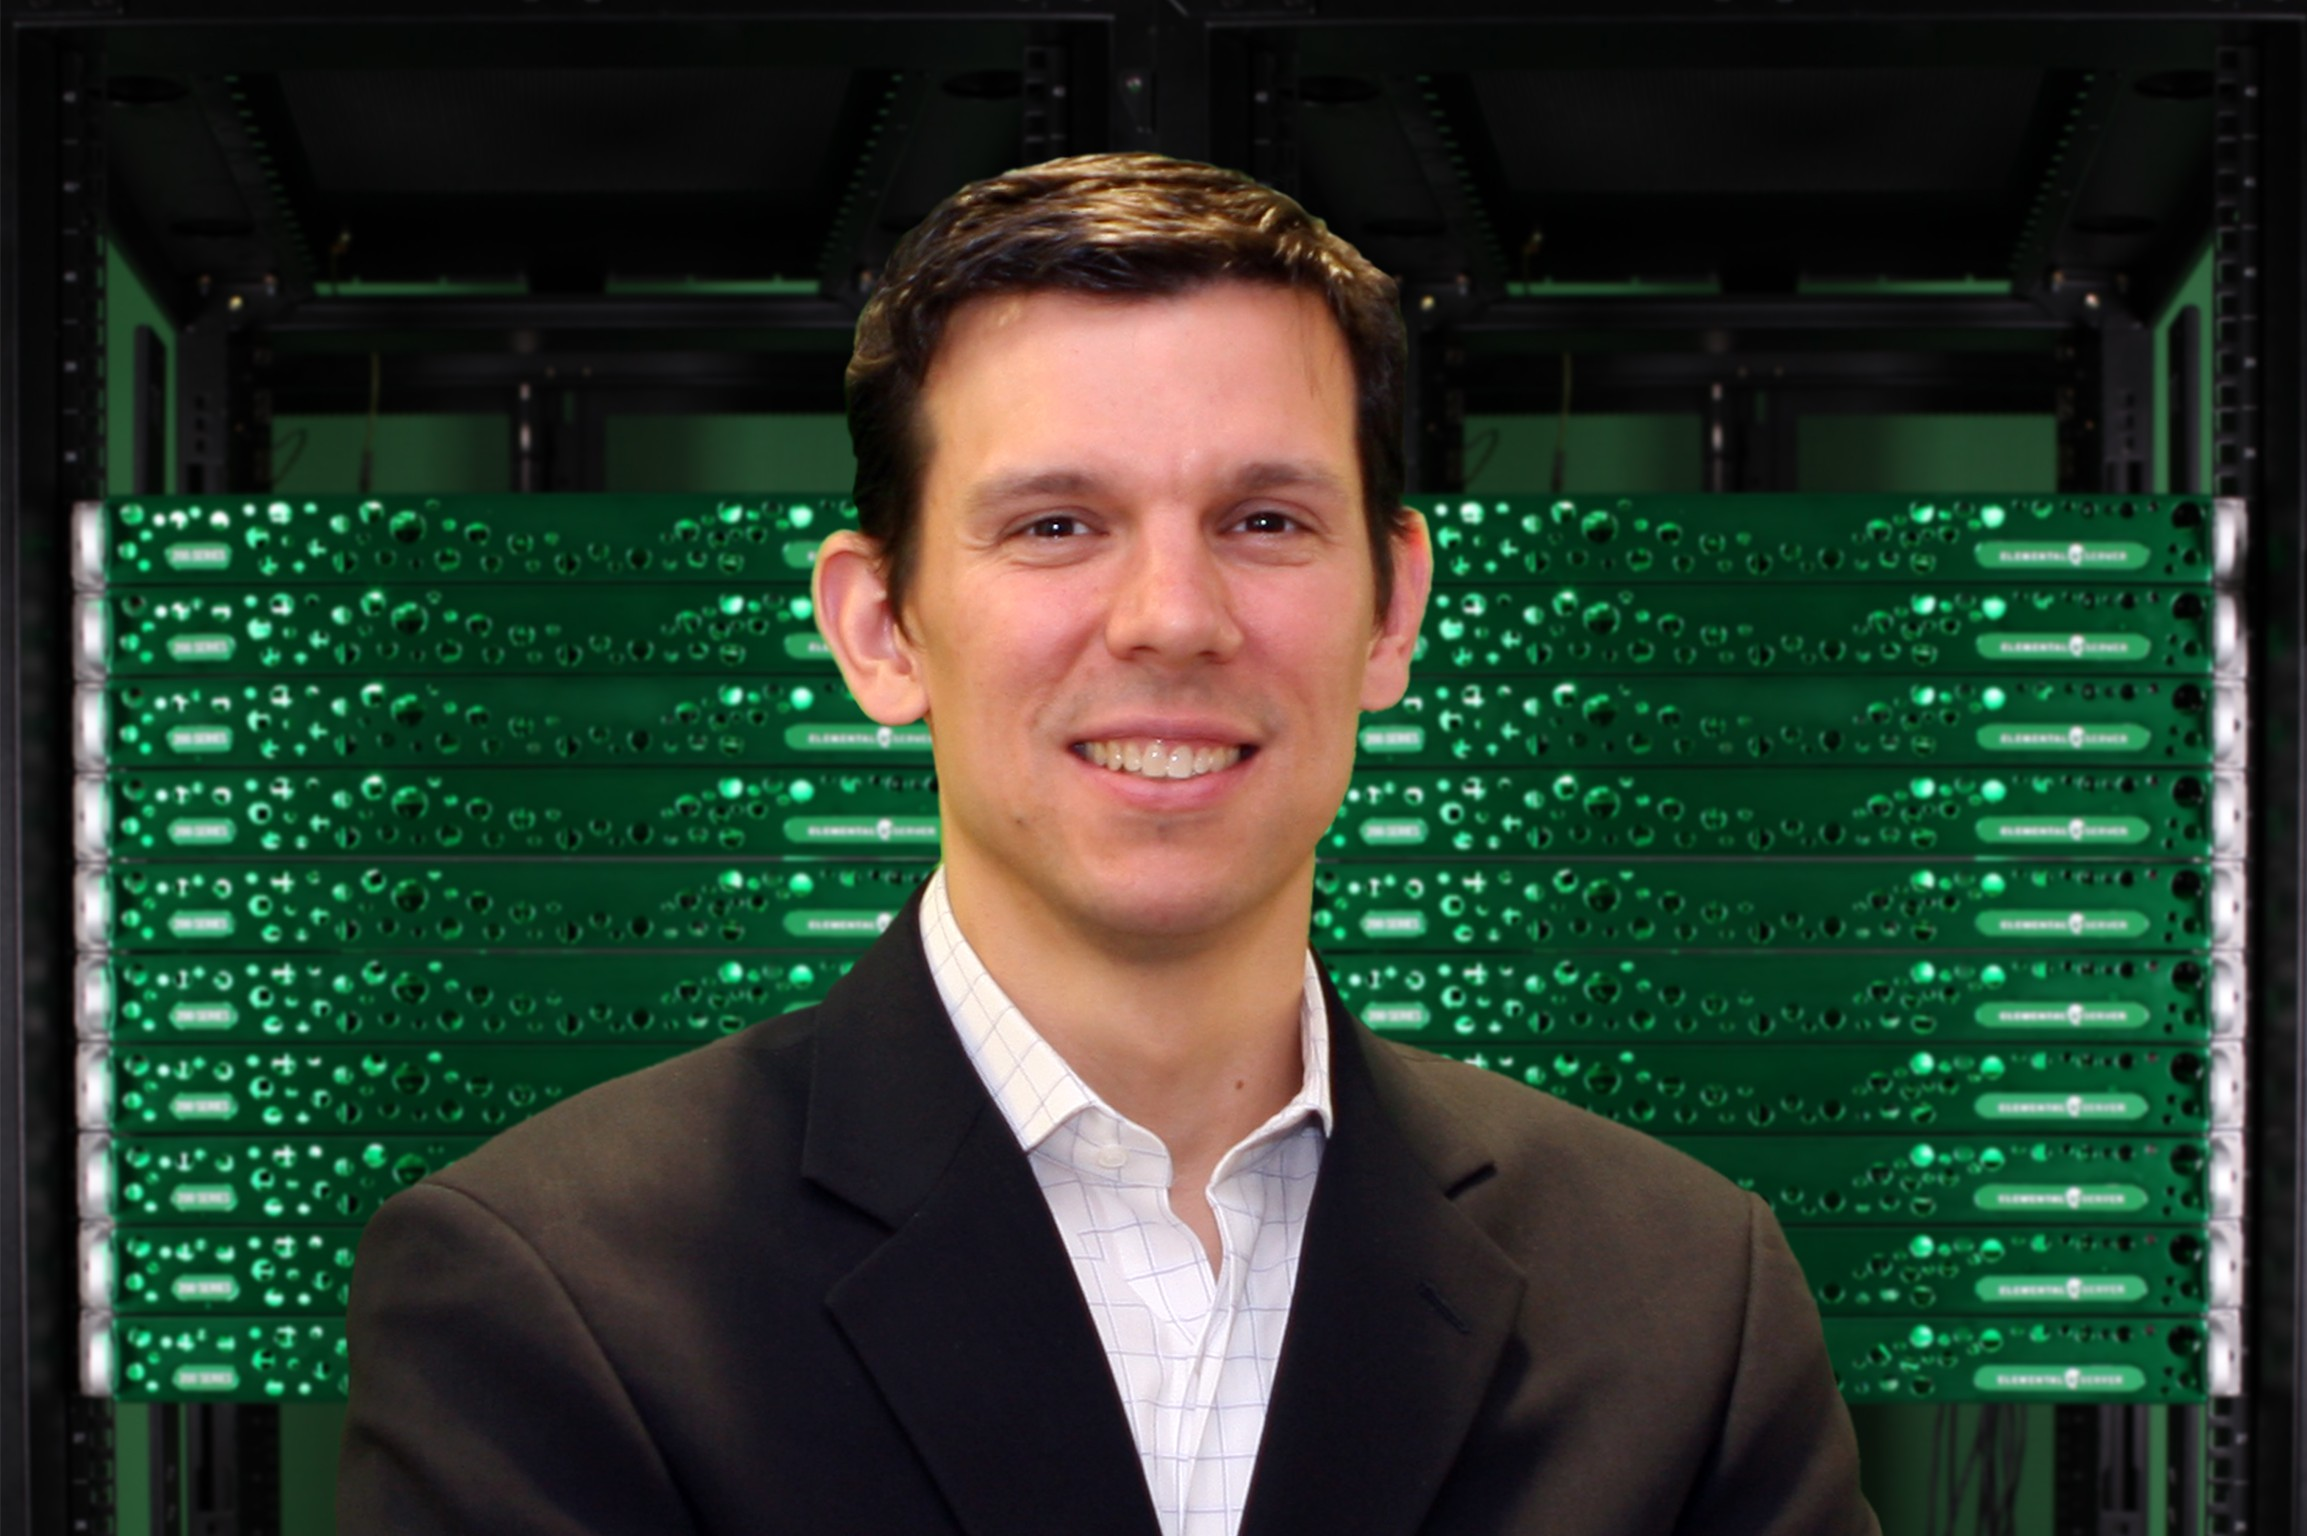 Sam Blackman, CEO of Elemental